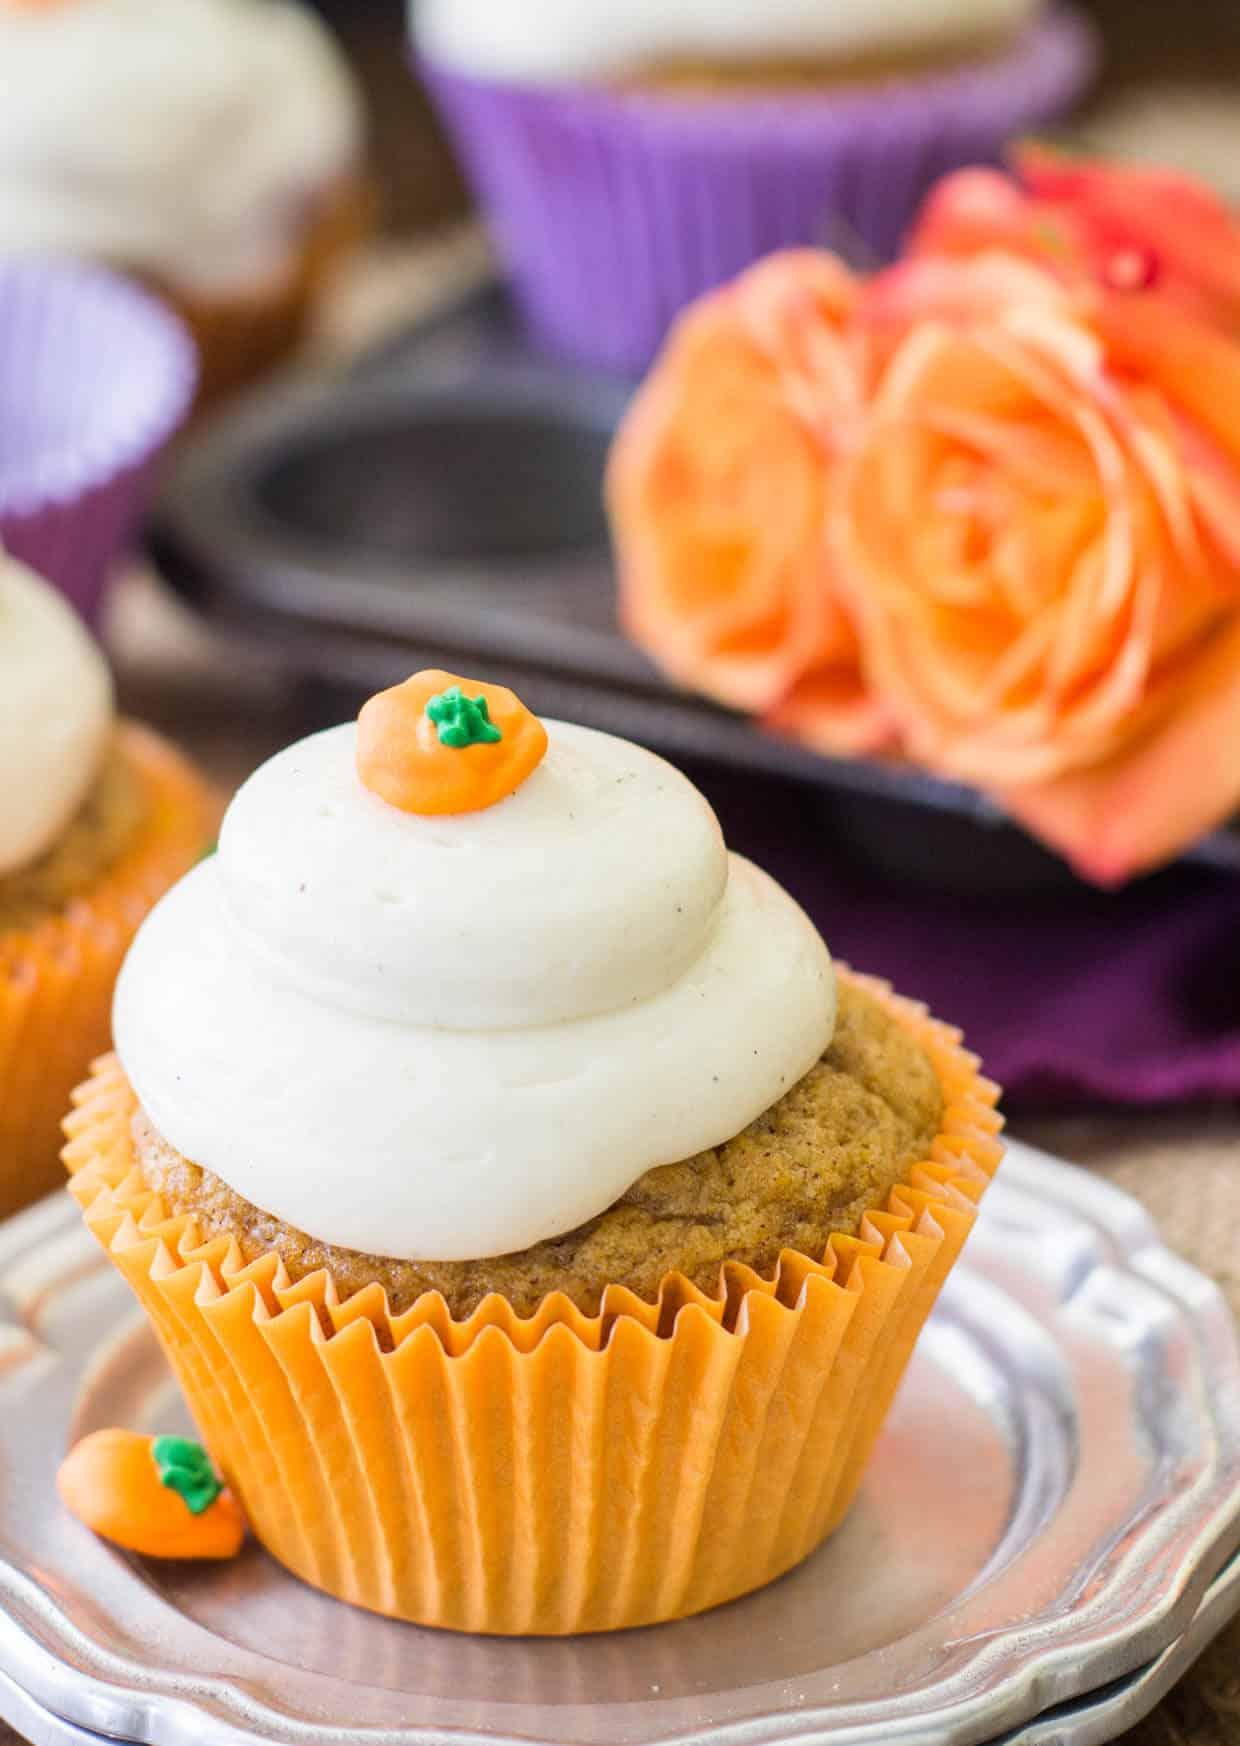 Pumpkin cupcake in orange wrapper on silver plate